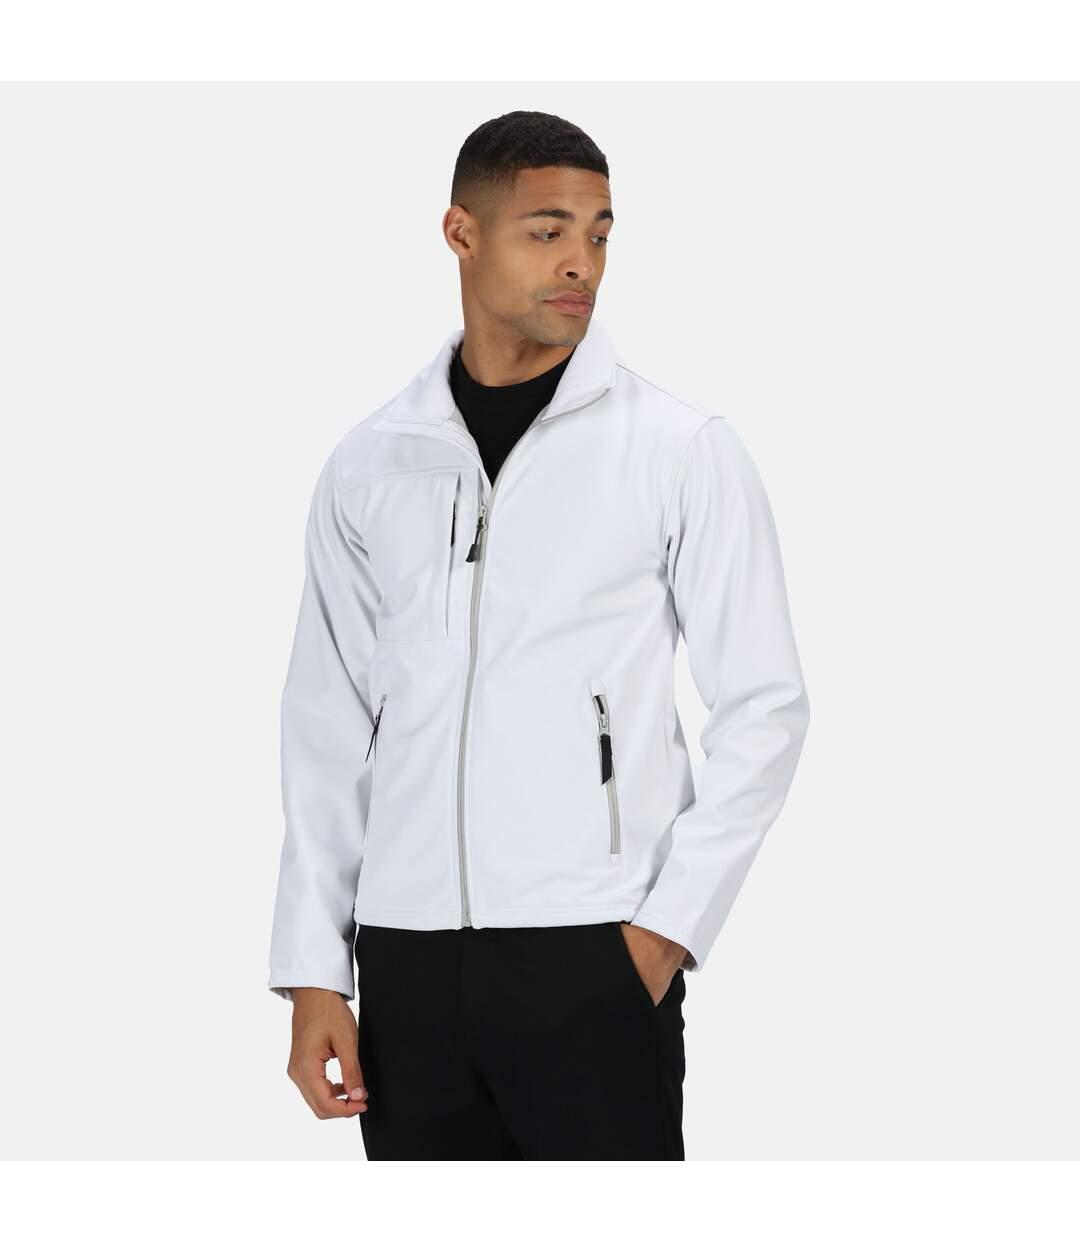 Regatta Professional Mens Octagon II Waterproof Softshell Jacket (Dark Spruce/Black) - UTRG2164